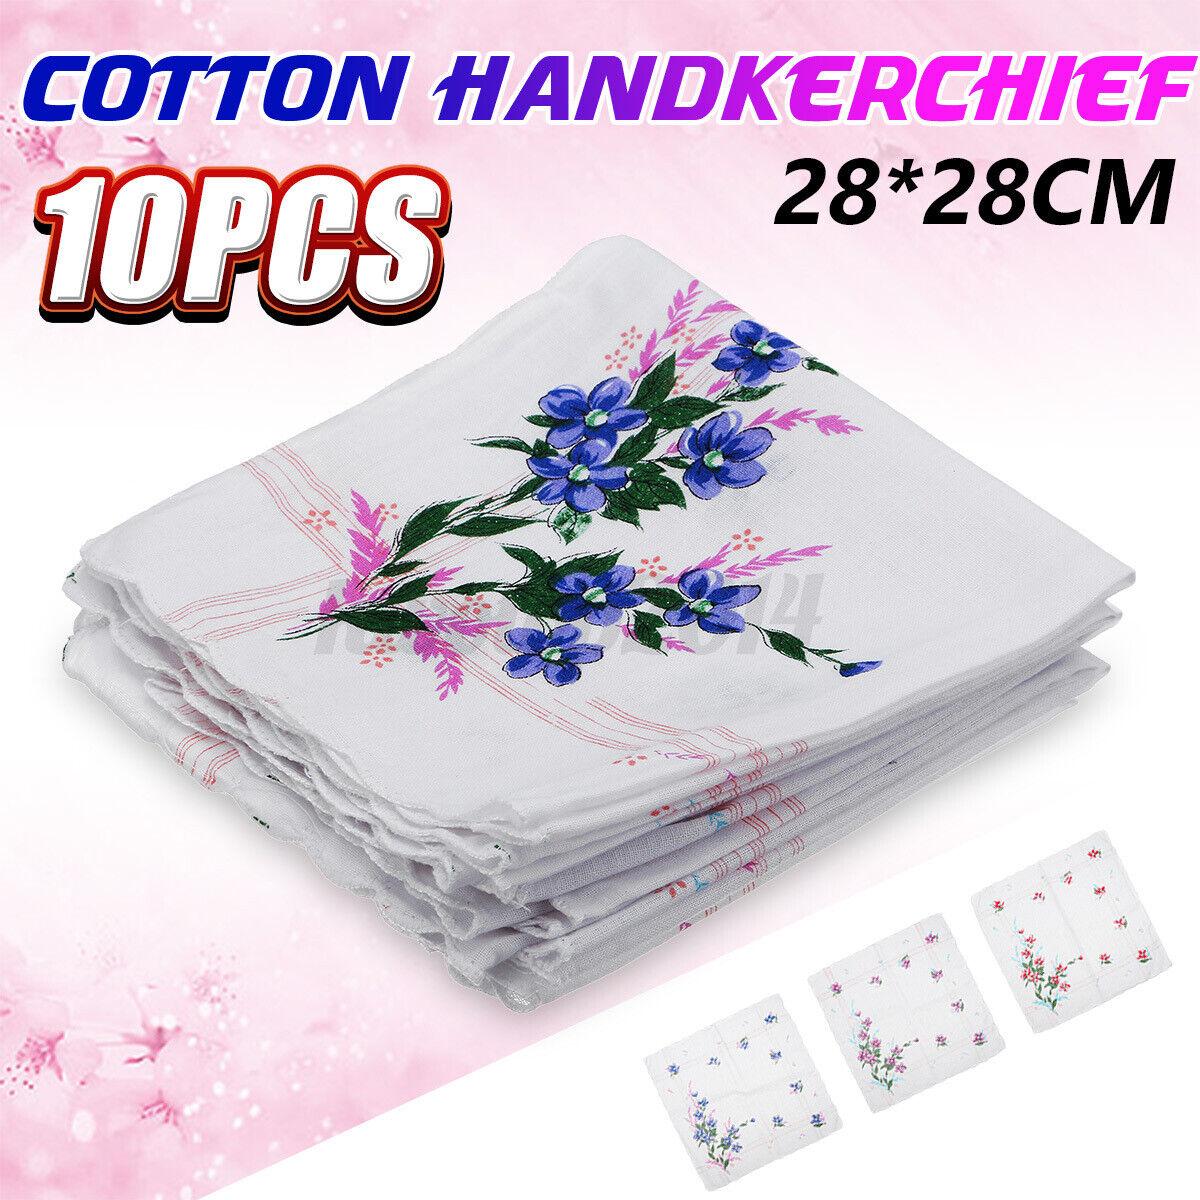 10Pcs 28x28cm Retro Cotton Floral Handkerchief Hankies Hanky Ladies Women Crafts